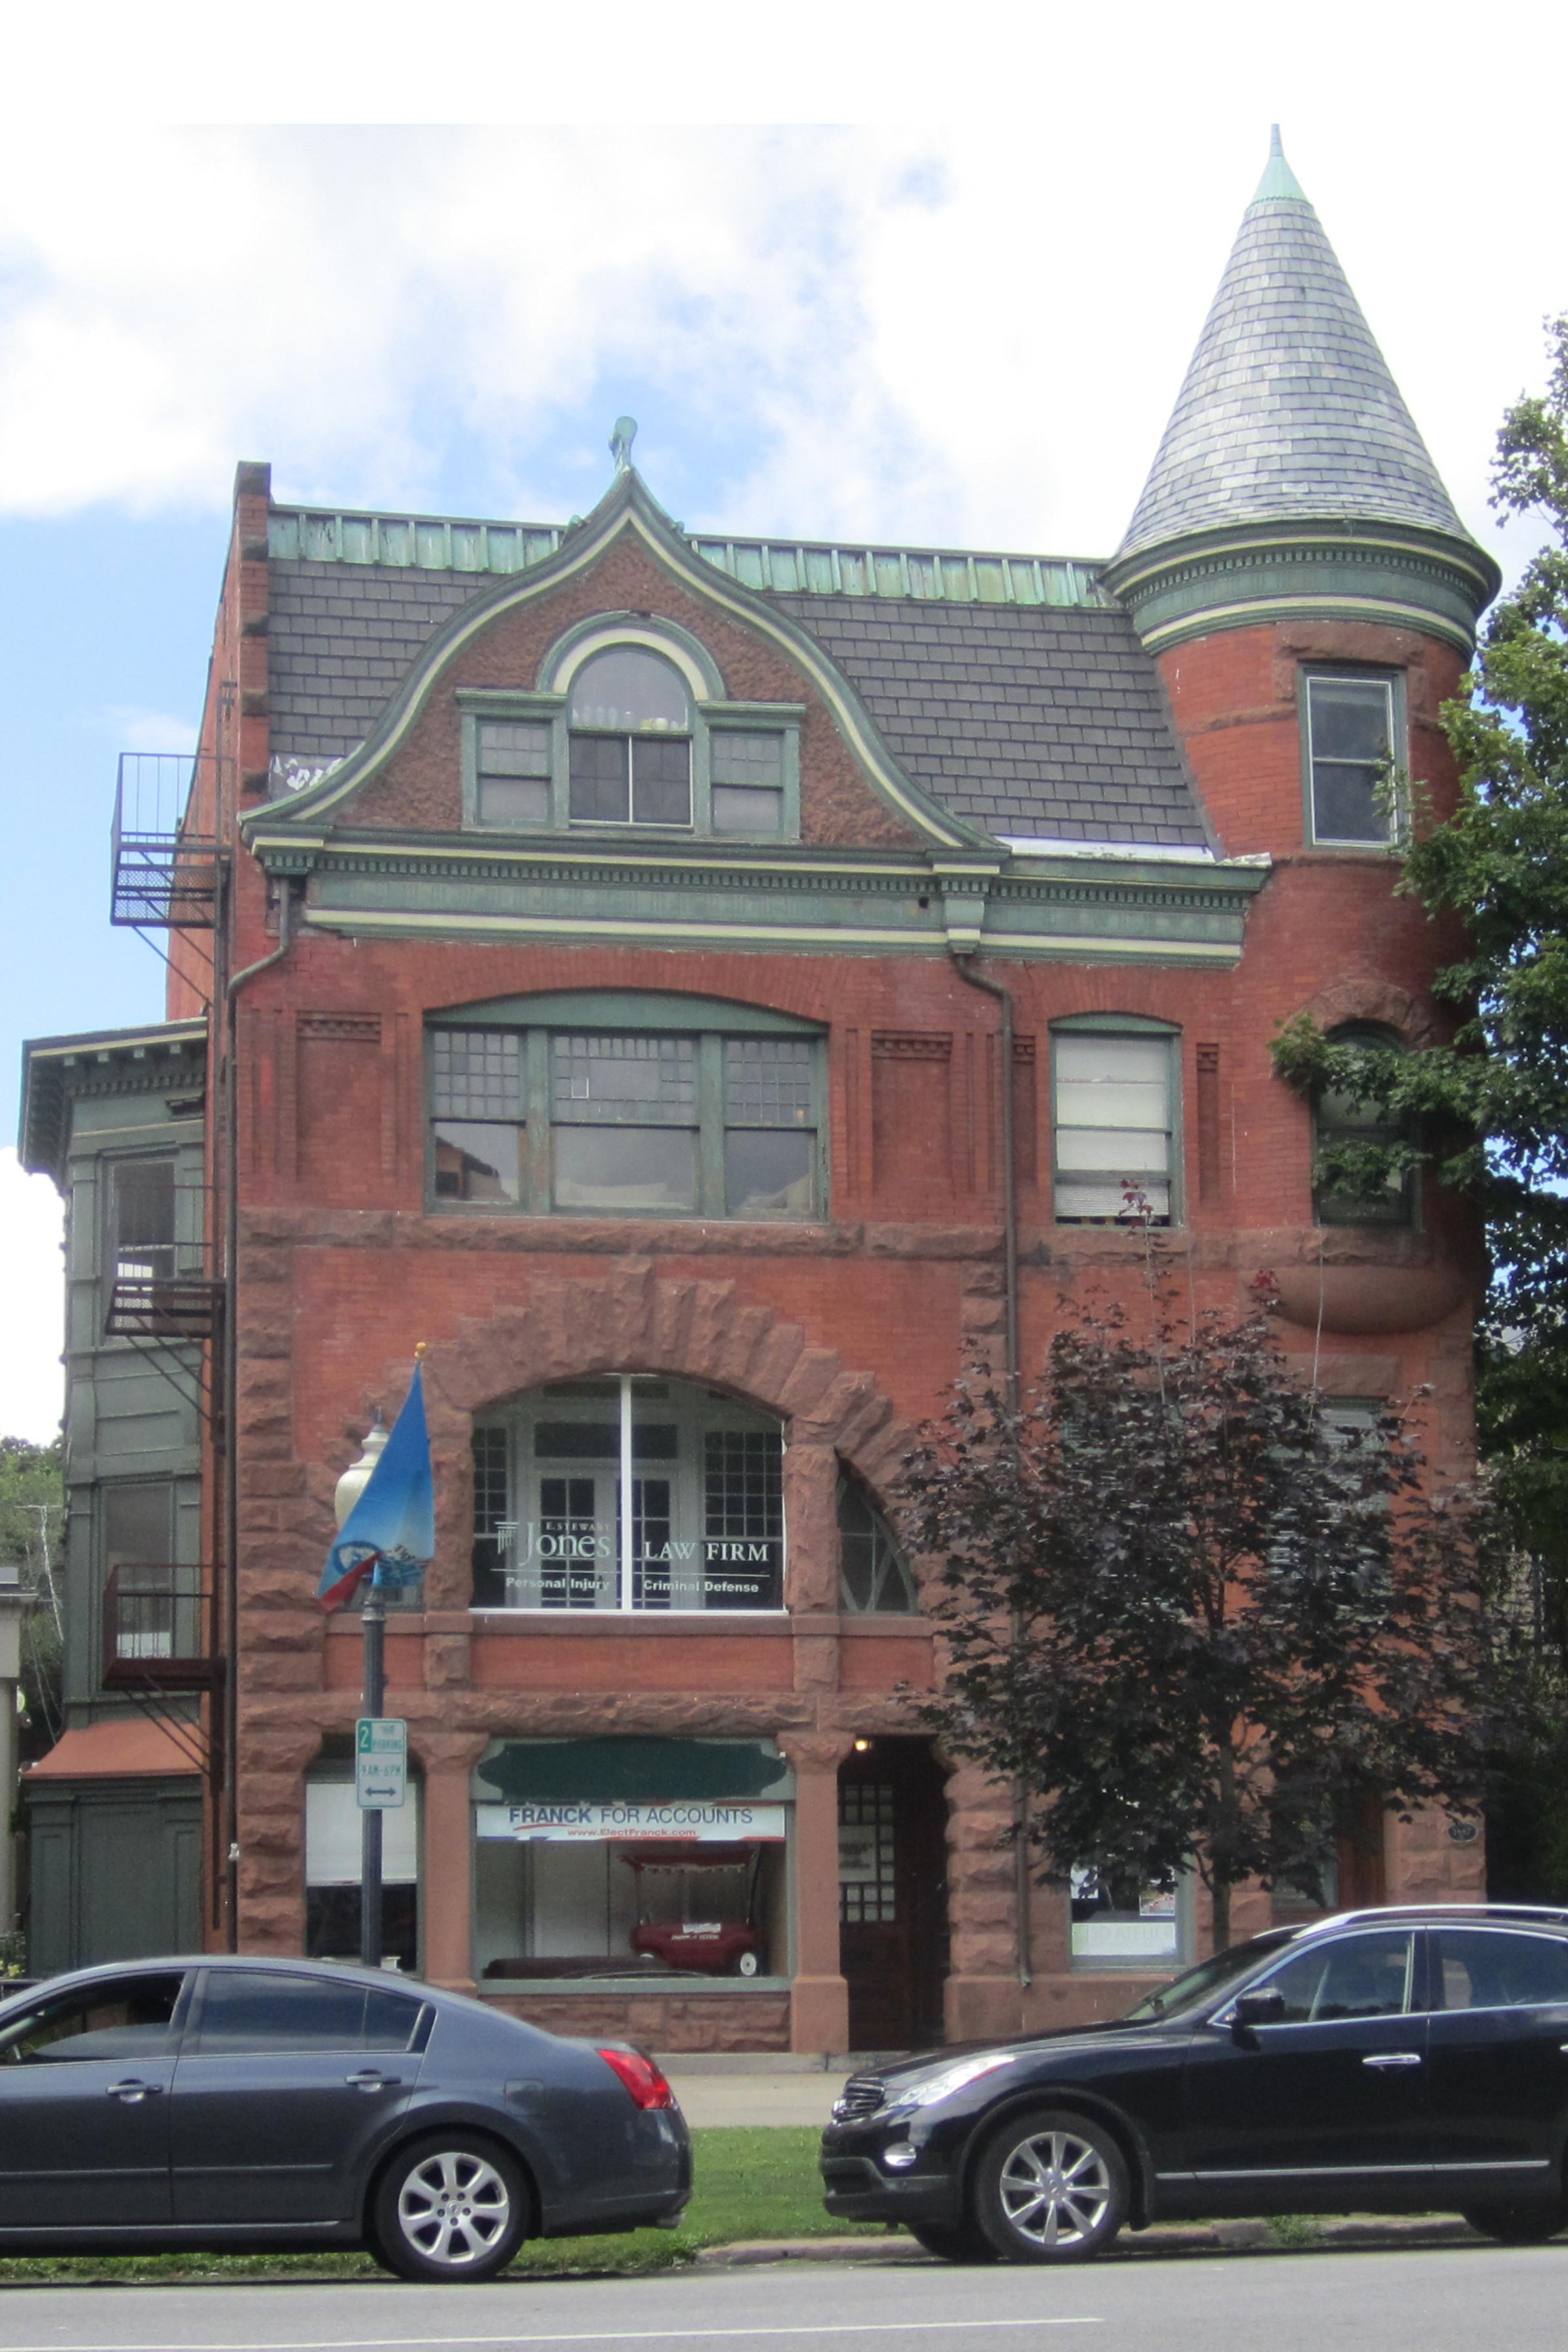 File:511 Broadway, Saratoga Springs NY jpg - Wikimedia Commons